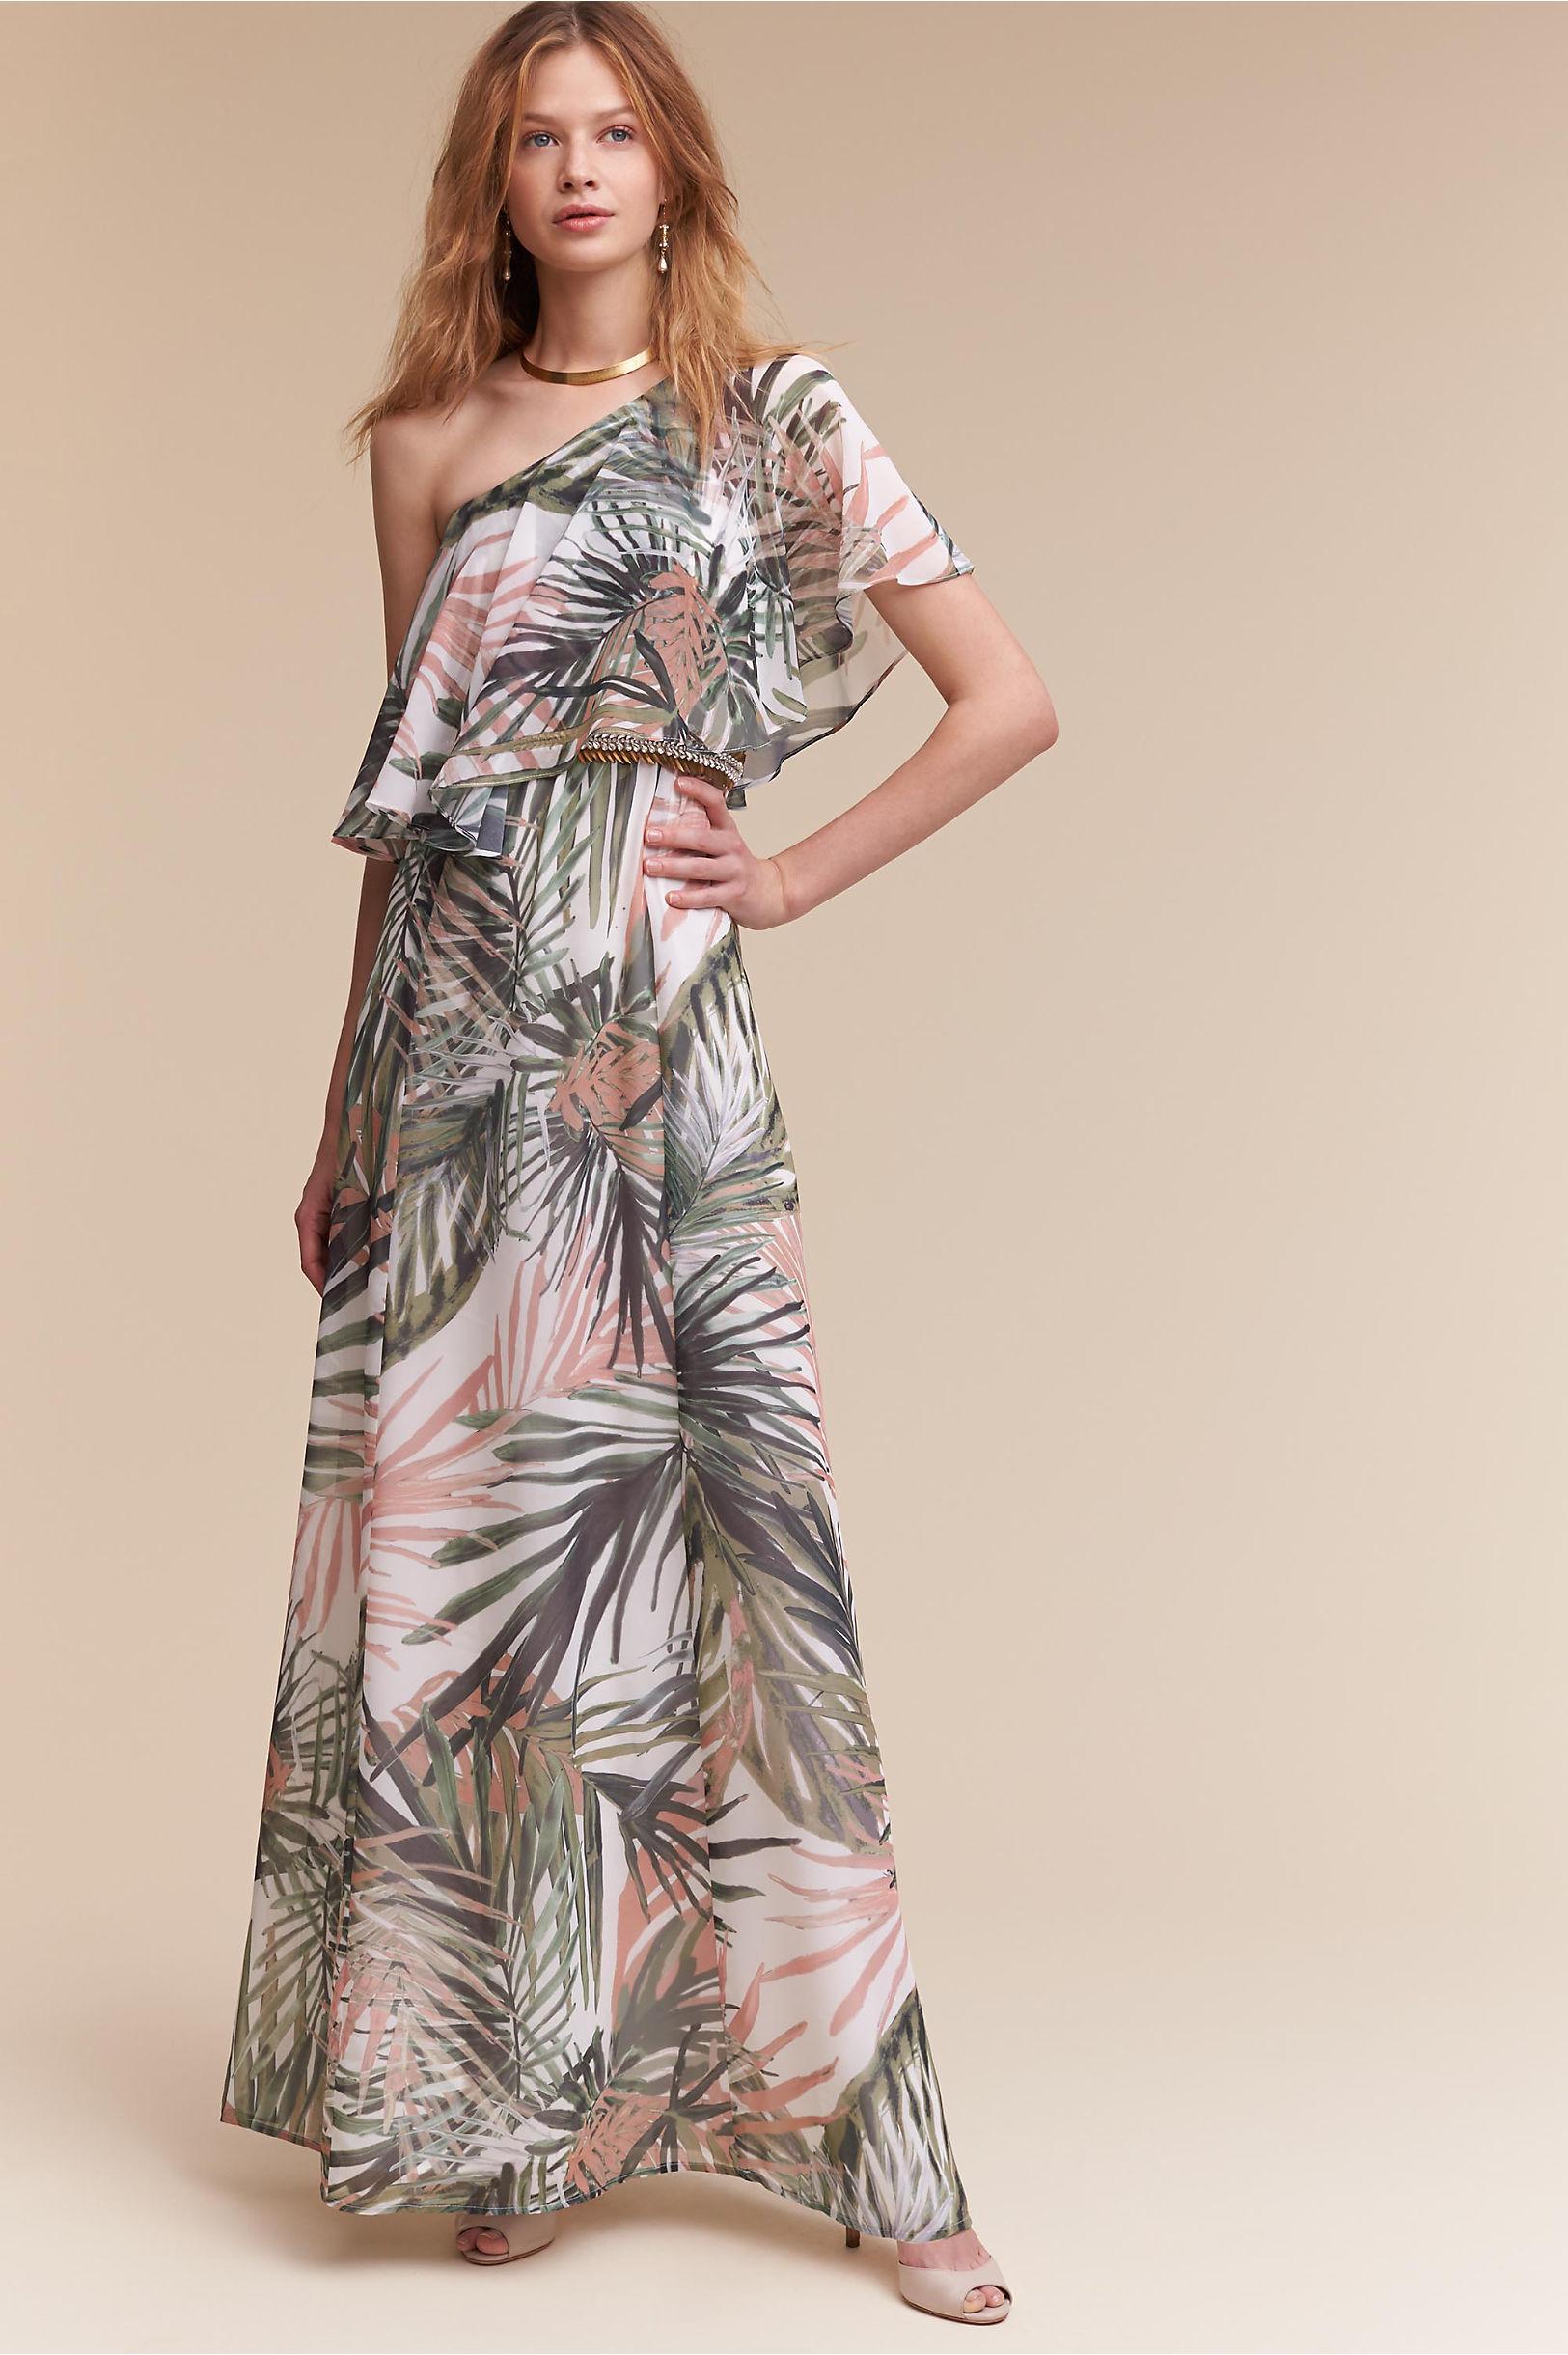 Imari Maxi Dress in Sale | BHLDN